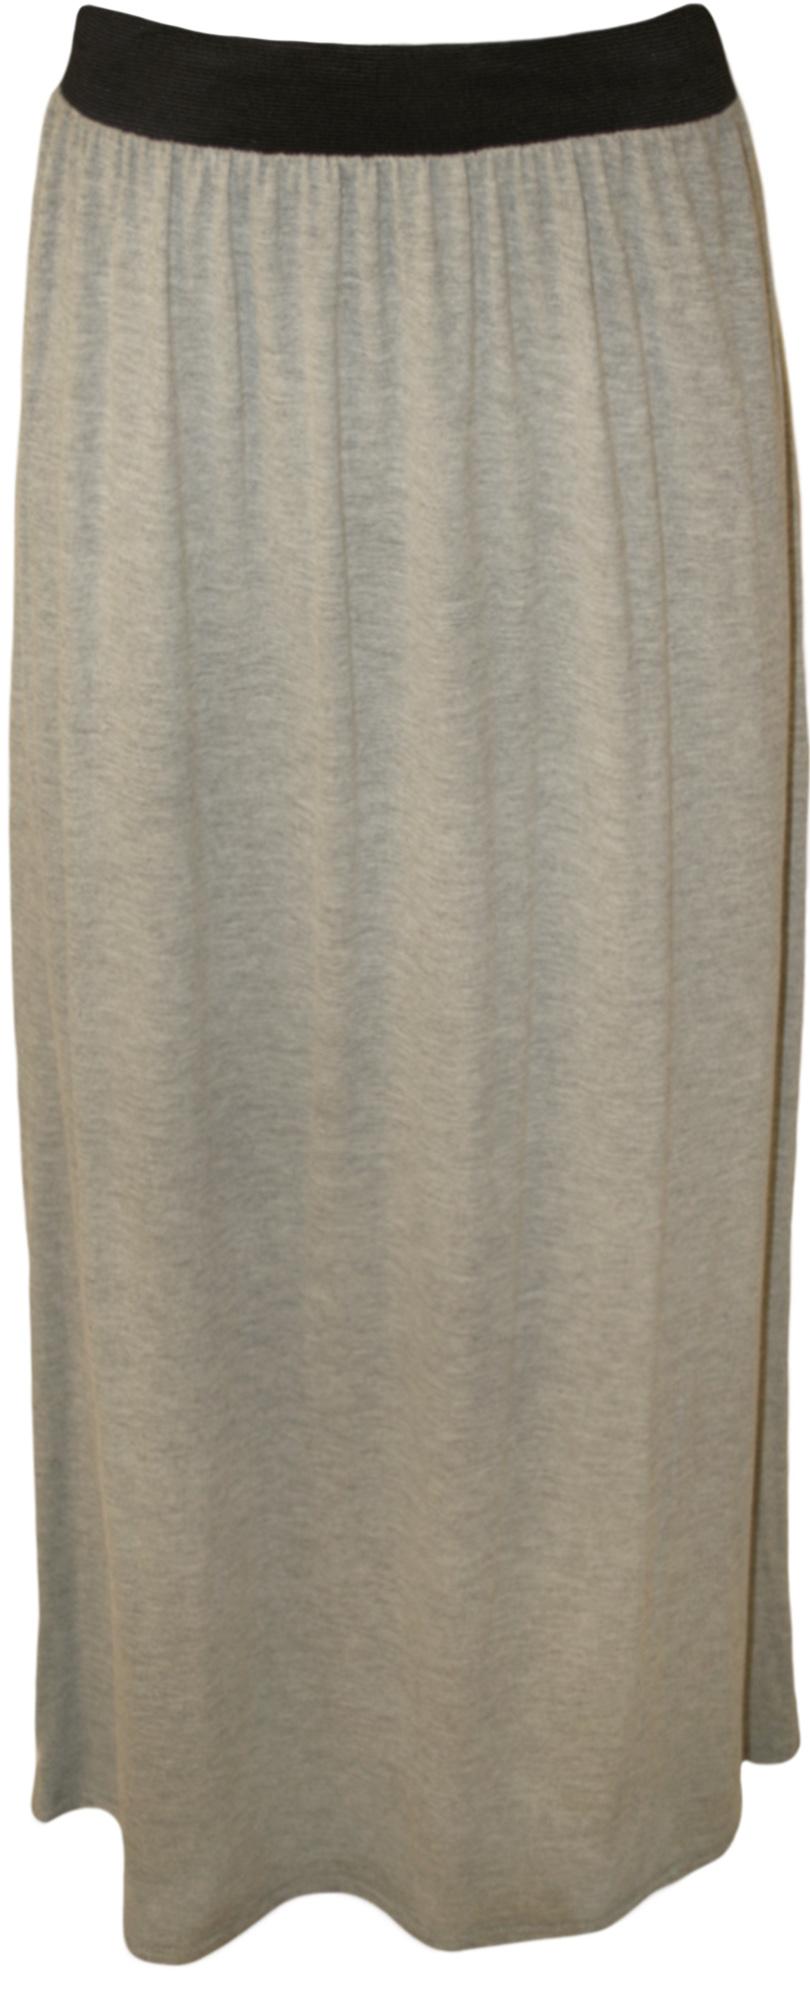 New-Plus-Size-Womens-Plain-Stretch-Elasticated-Ladies-Full-Long-Maxi-Skirt-12-26